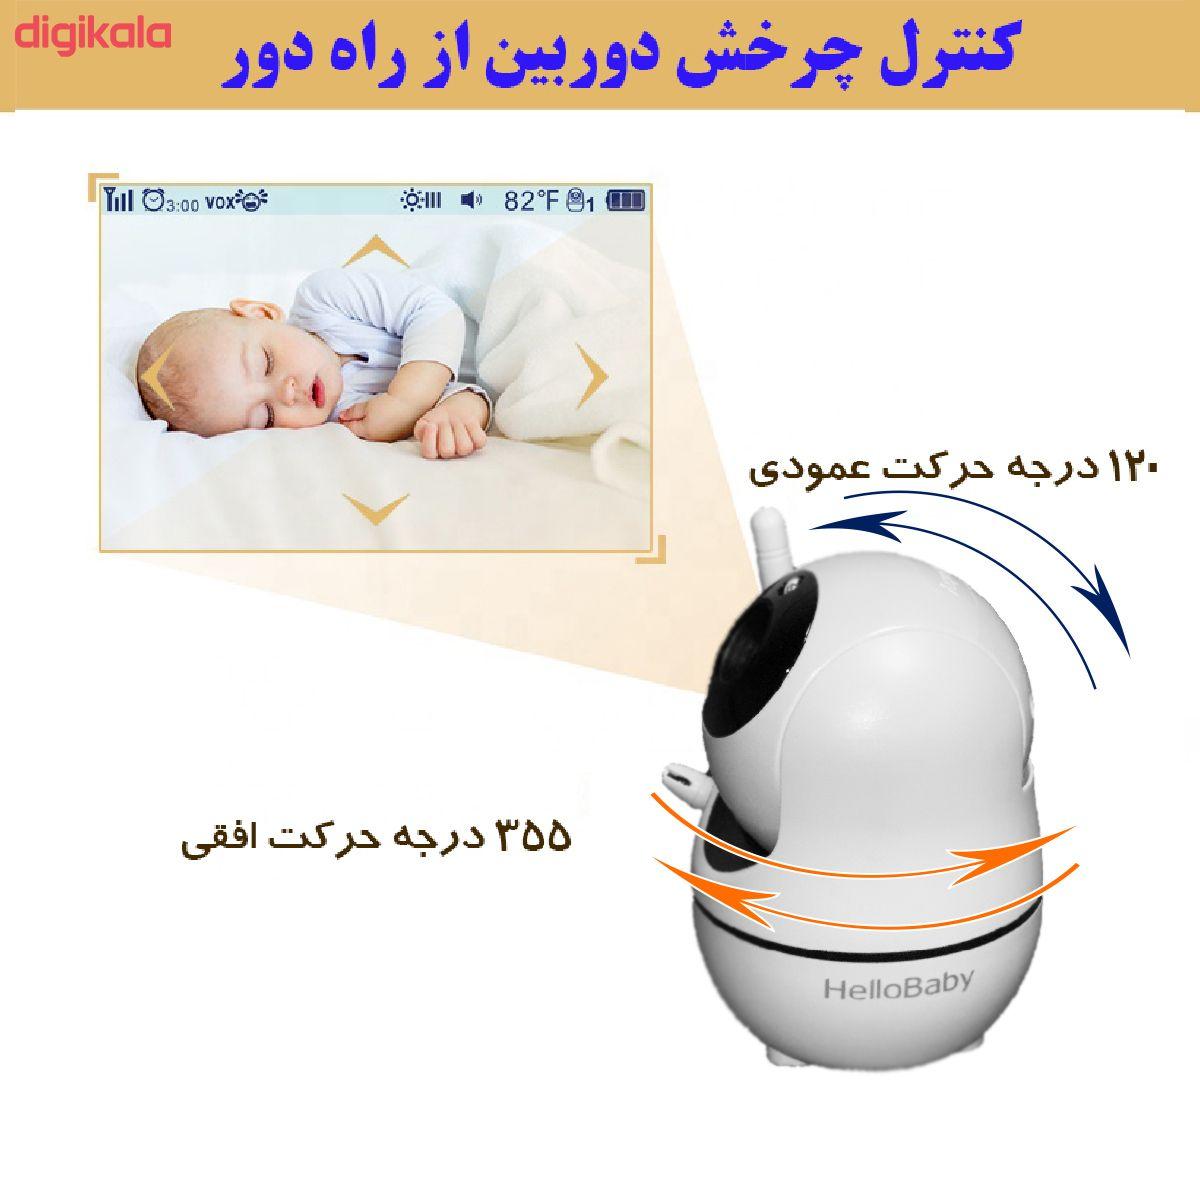 دوربین کنترل کودک هلوبیبی مدل HB66 main 1 2